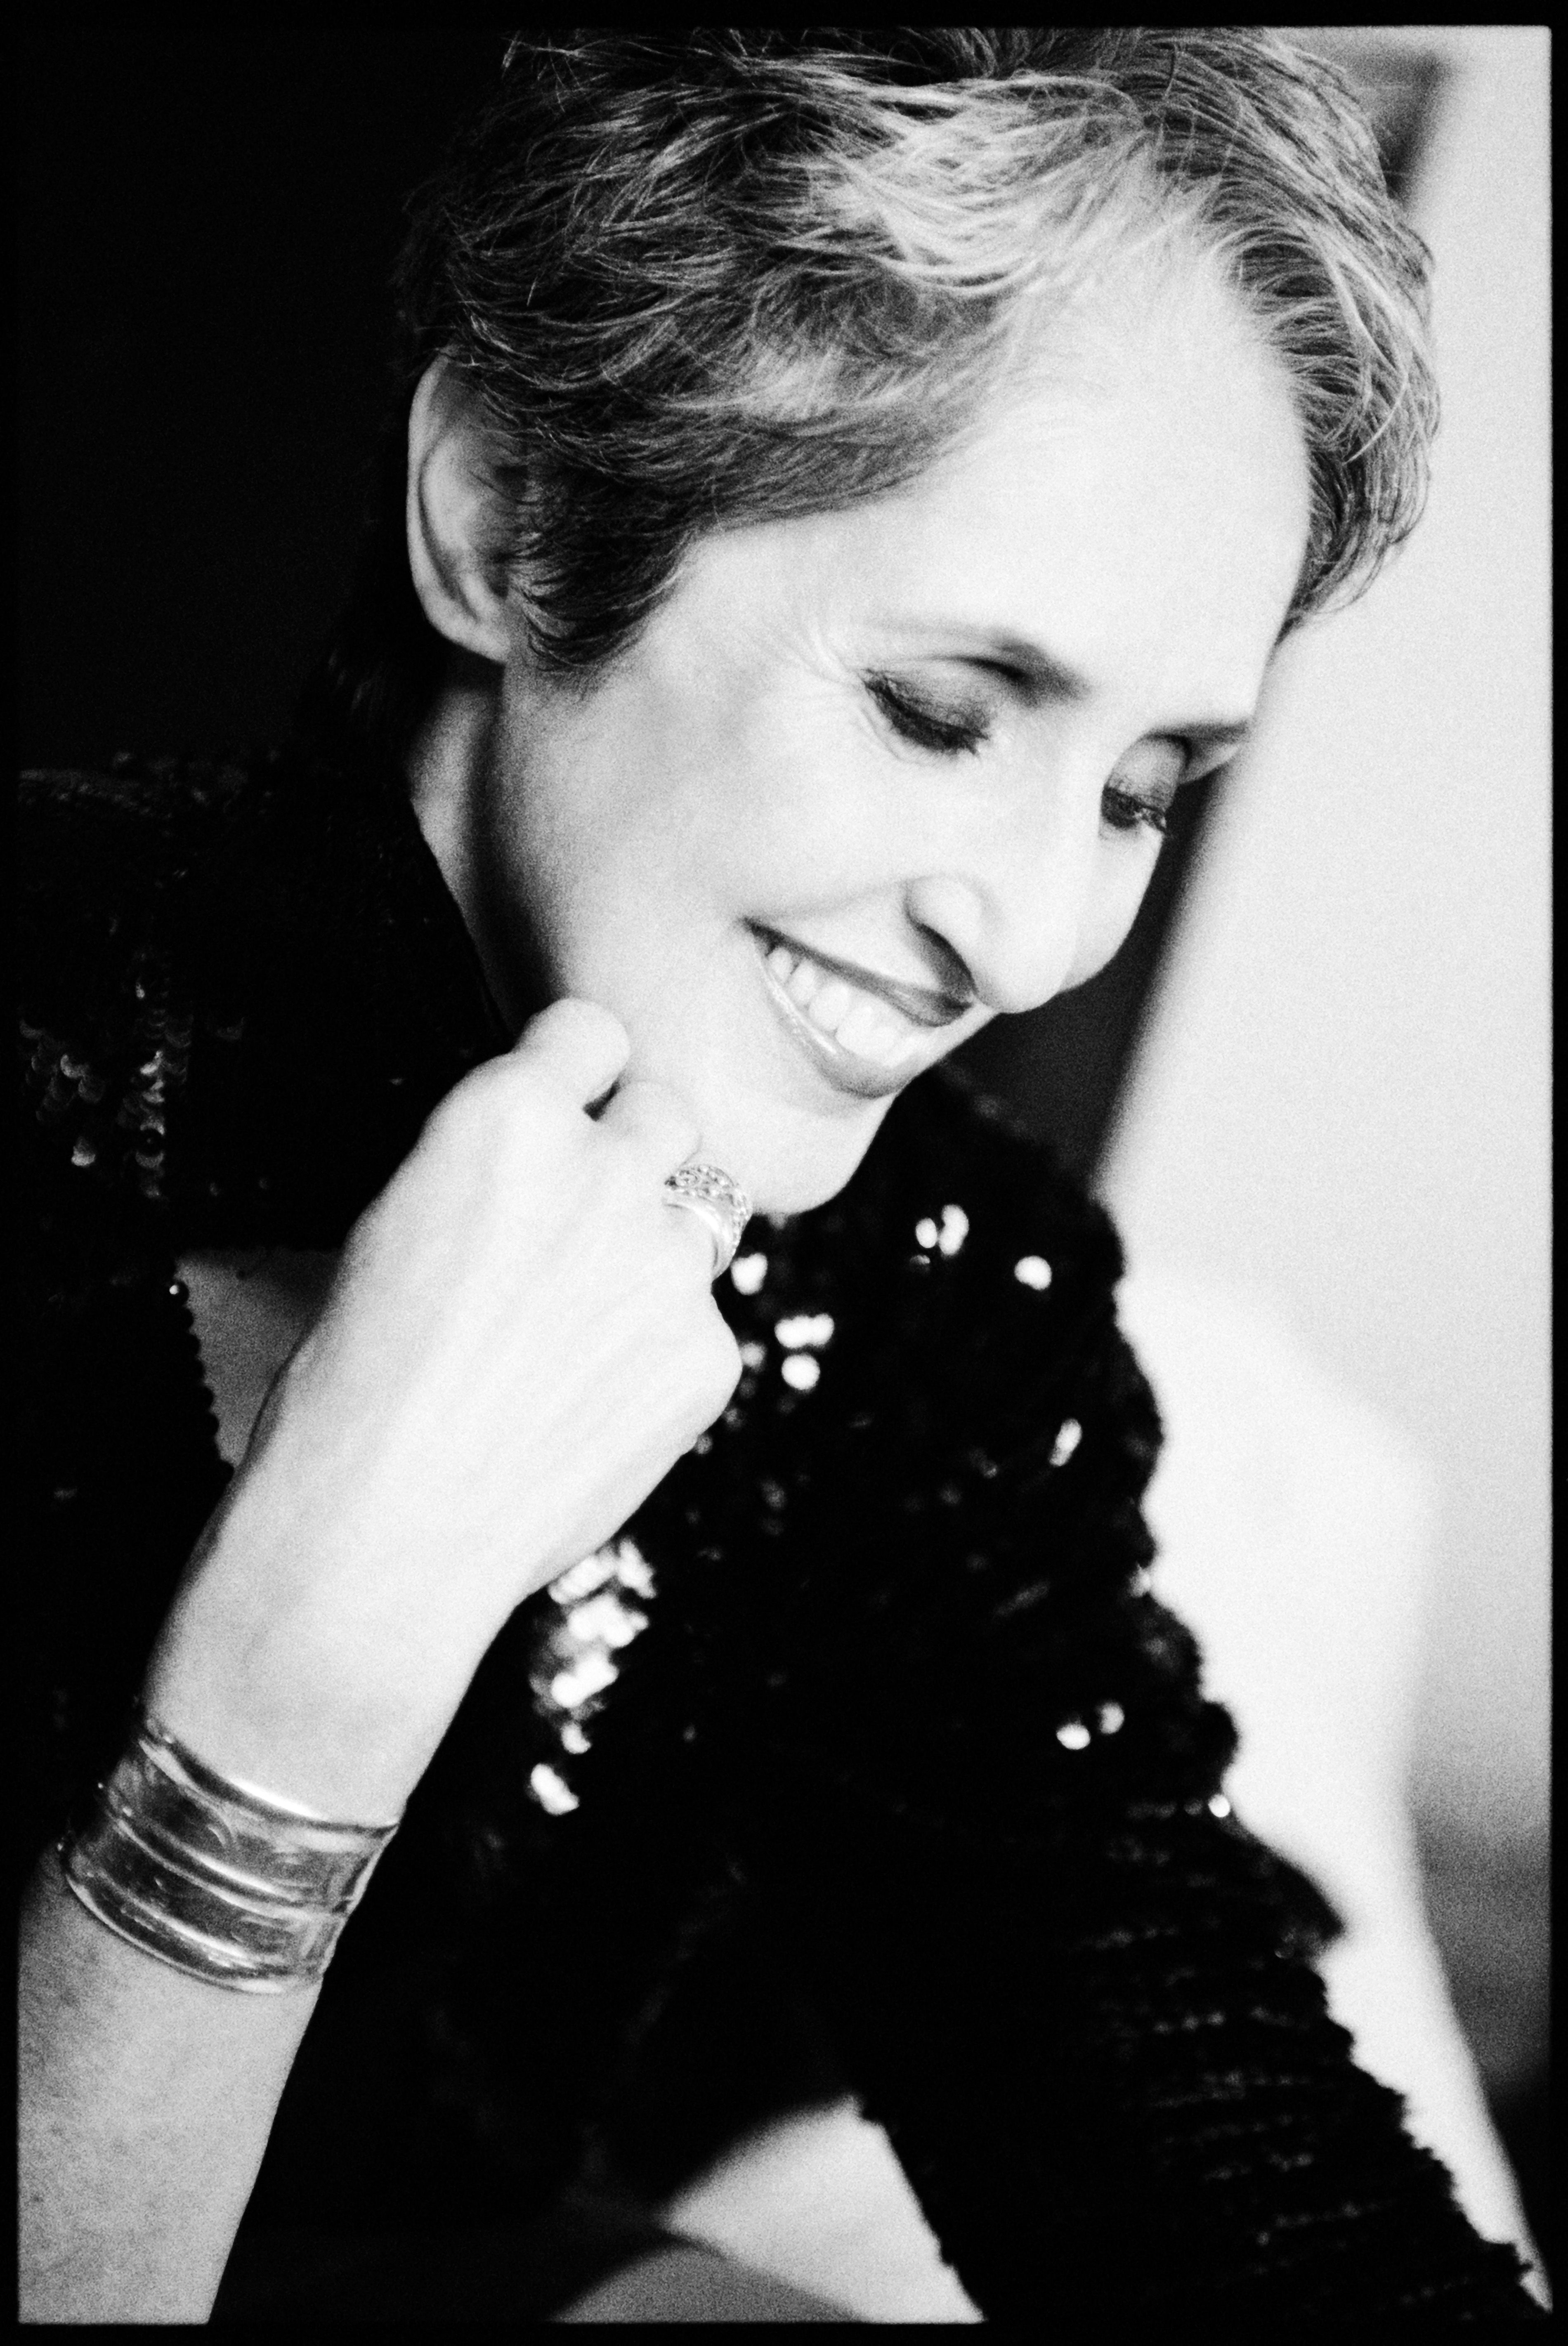 Joan Baez. 50 years of singing her conscience.